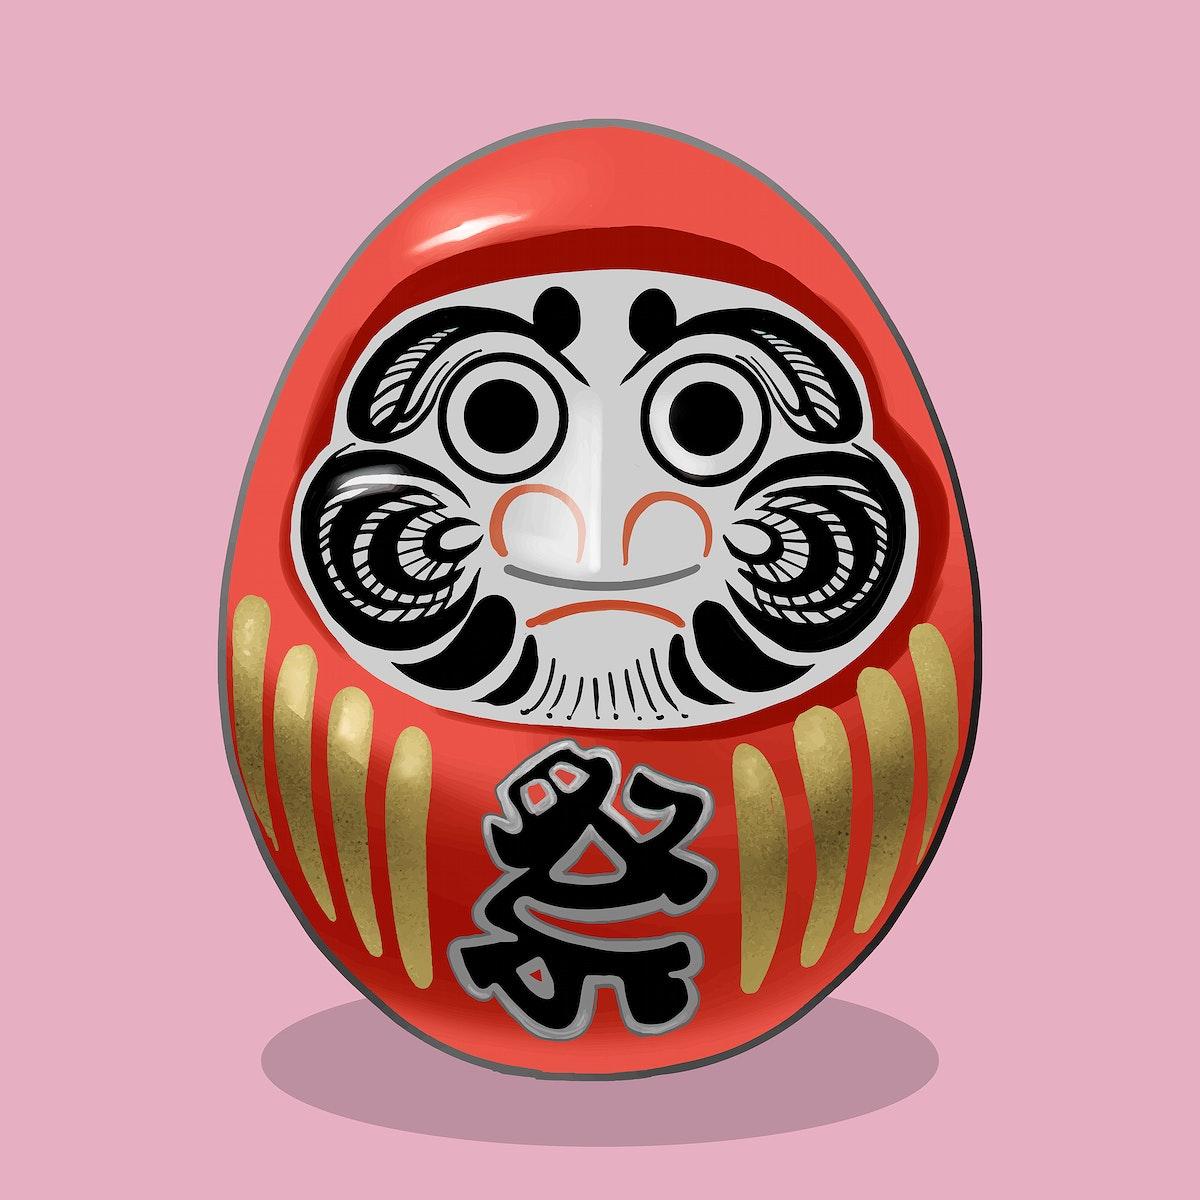 Daruma, a traditional Japanese doll illustration